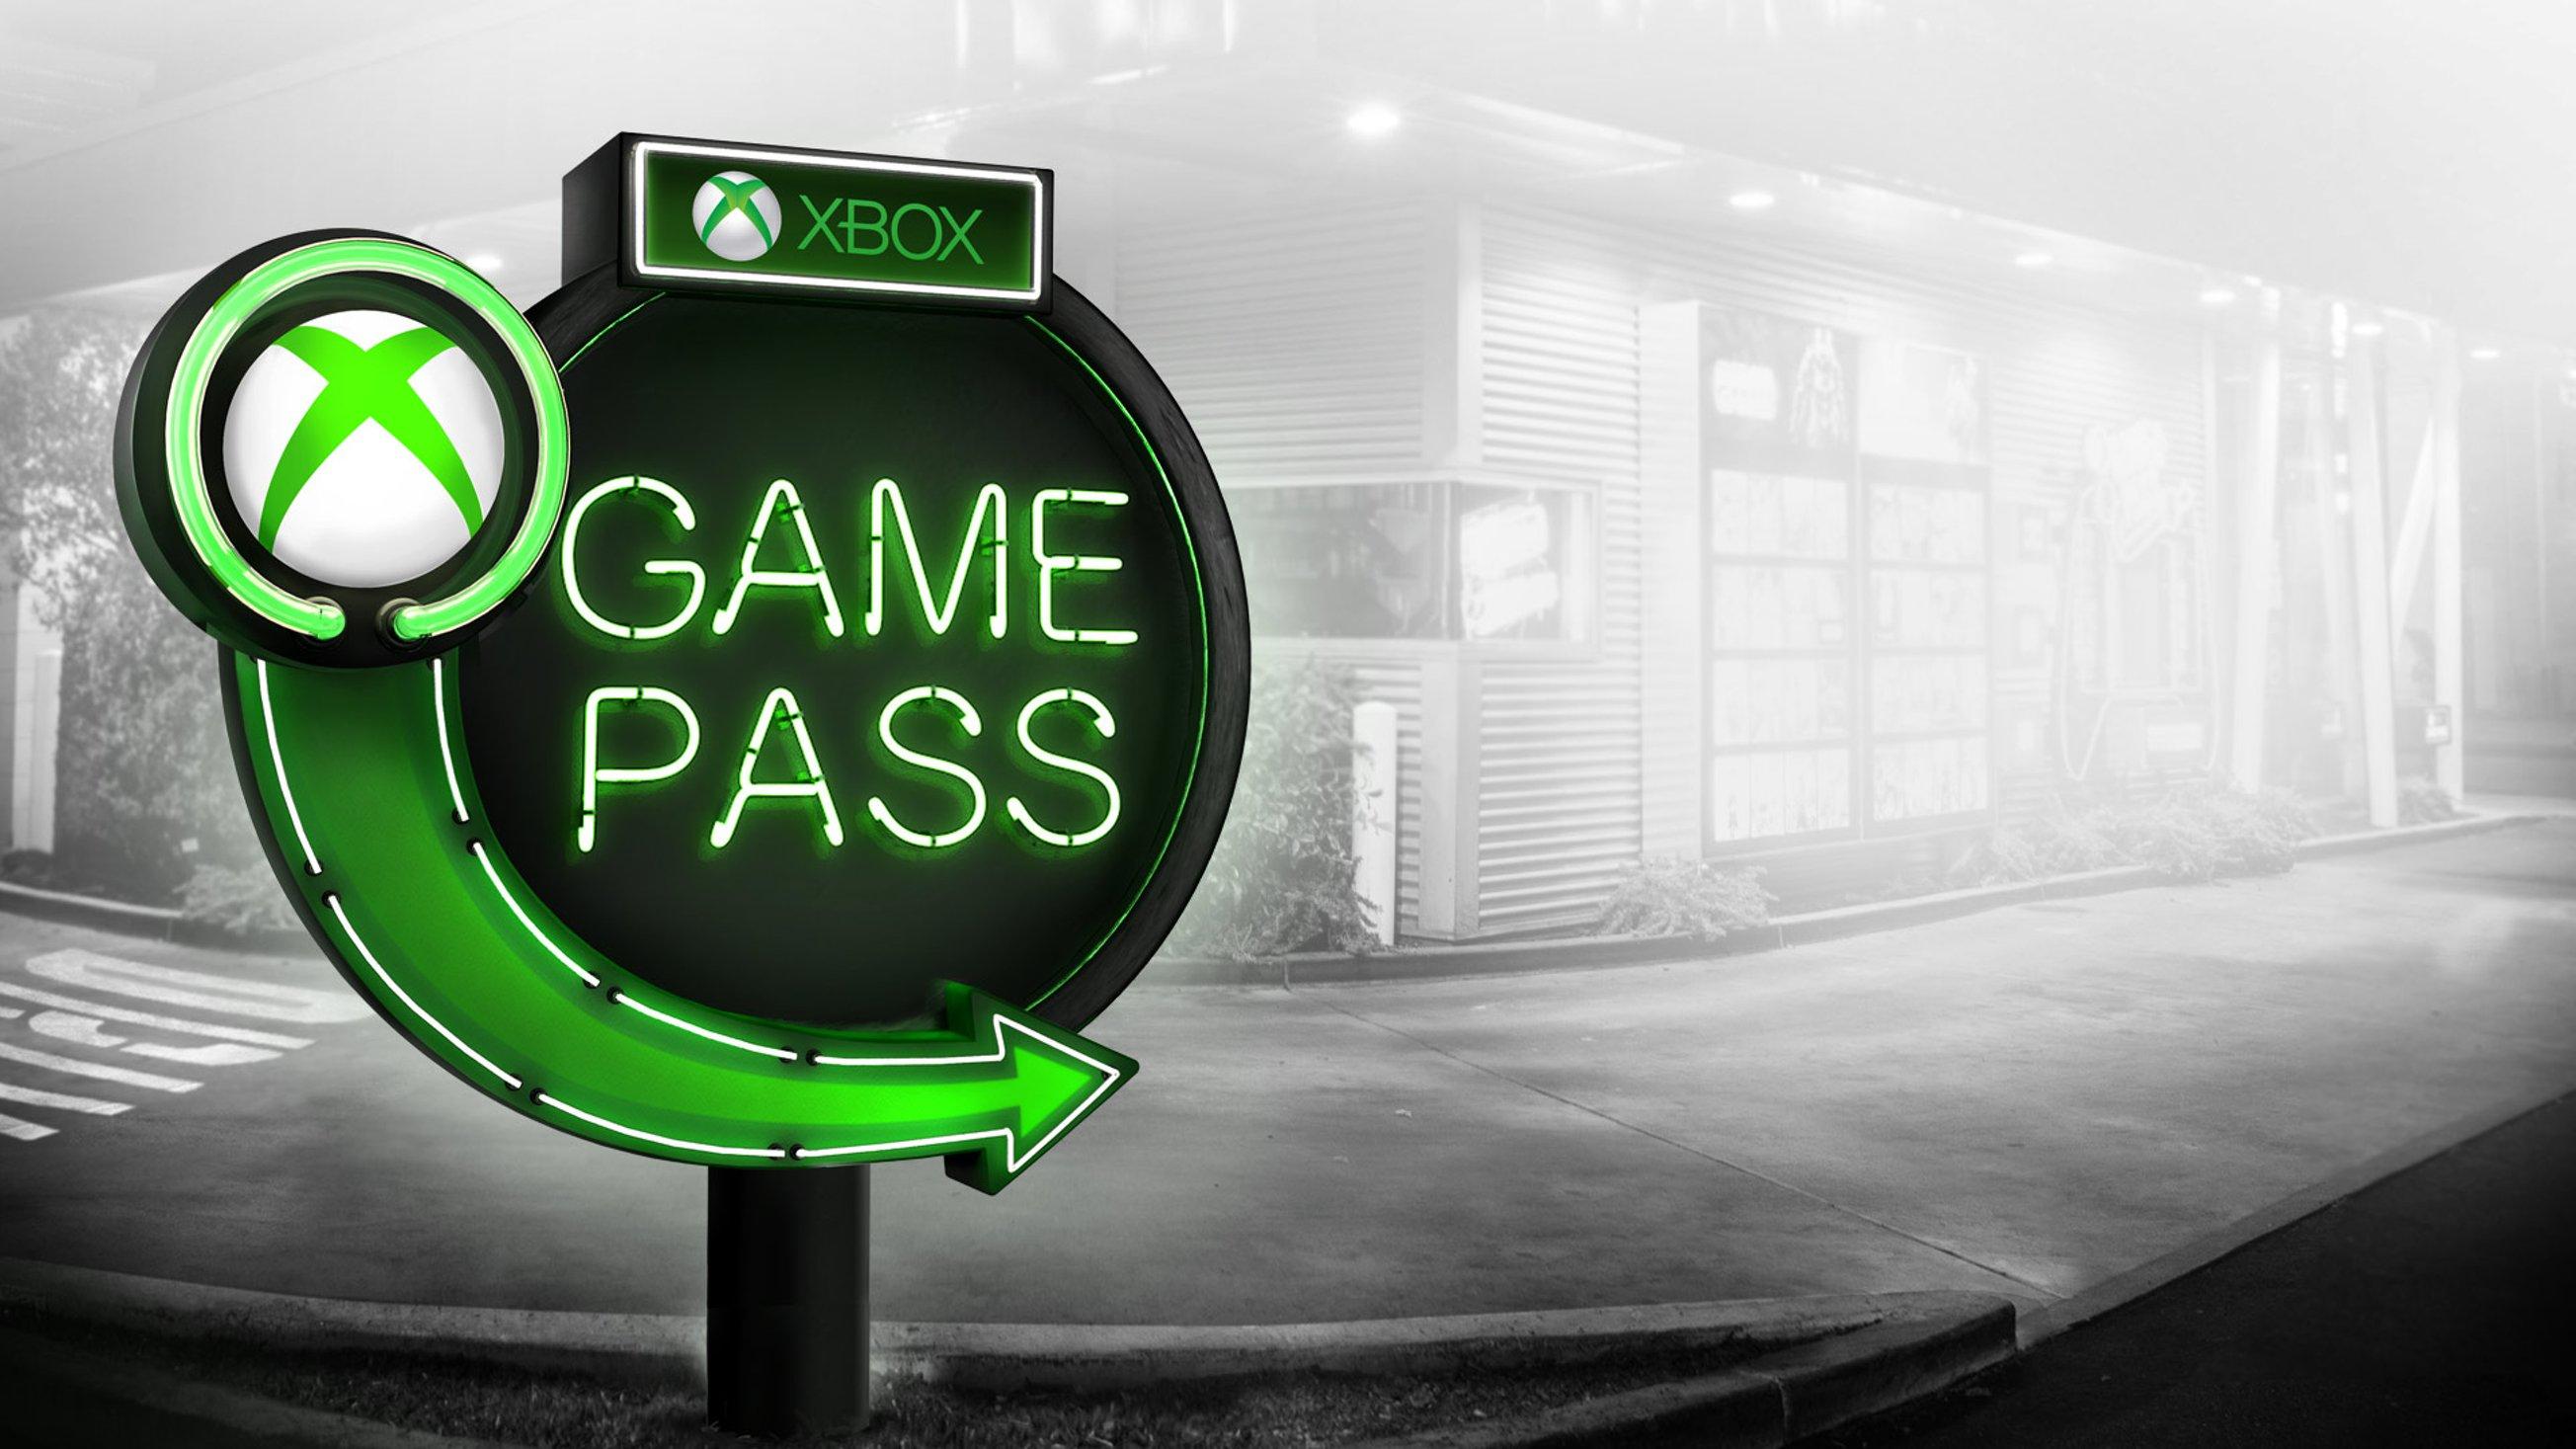 Xbox Game Pass tops 10 million subscribers screenshot